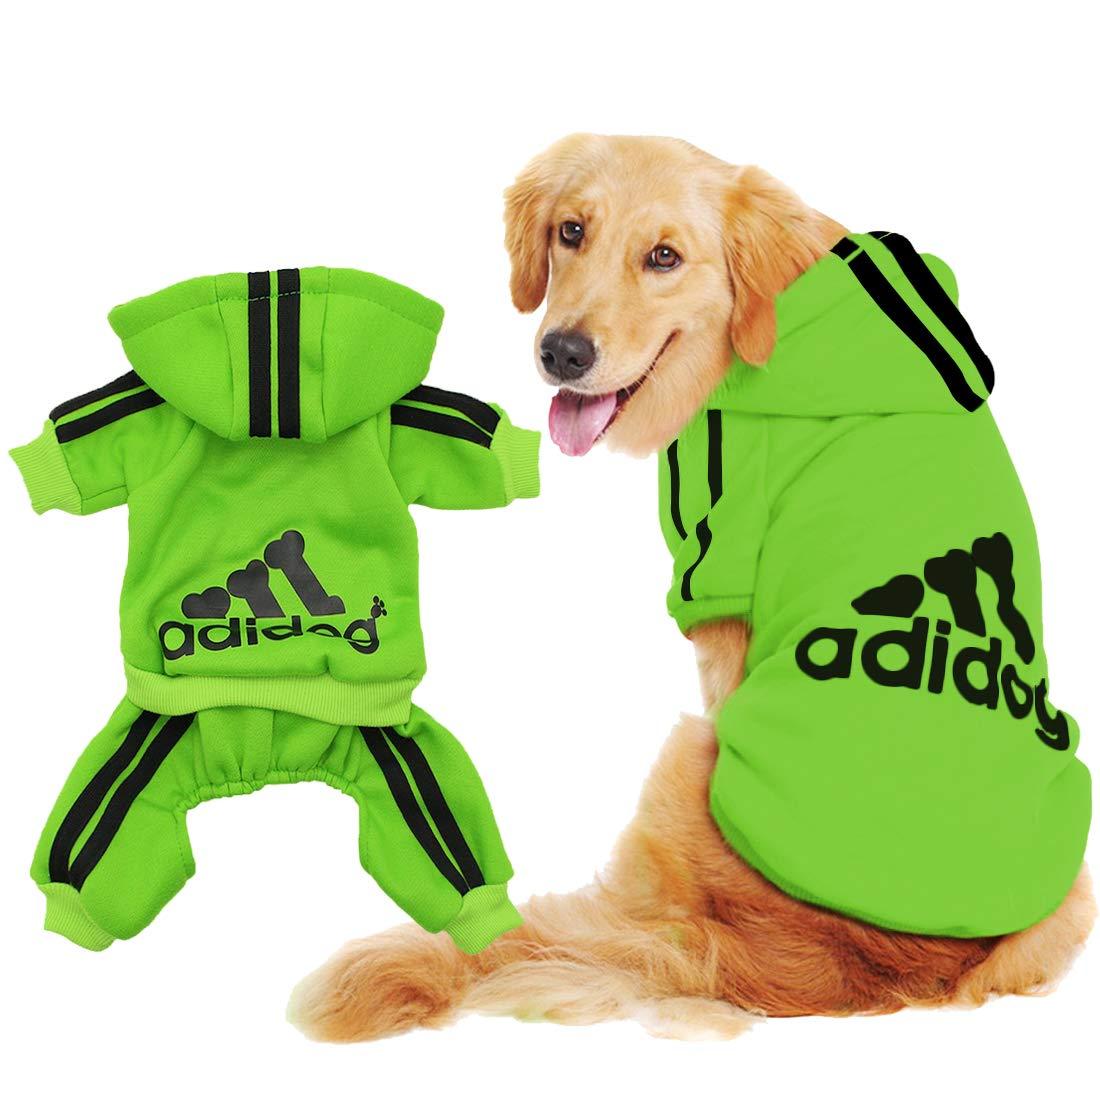 Scheppend Original Adidog Big Dog Large Clothes Sport Hoodies Sweatshirt Pet Winter Coat Retriever Outfits, Green 6XL